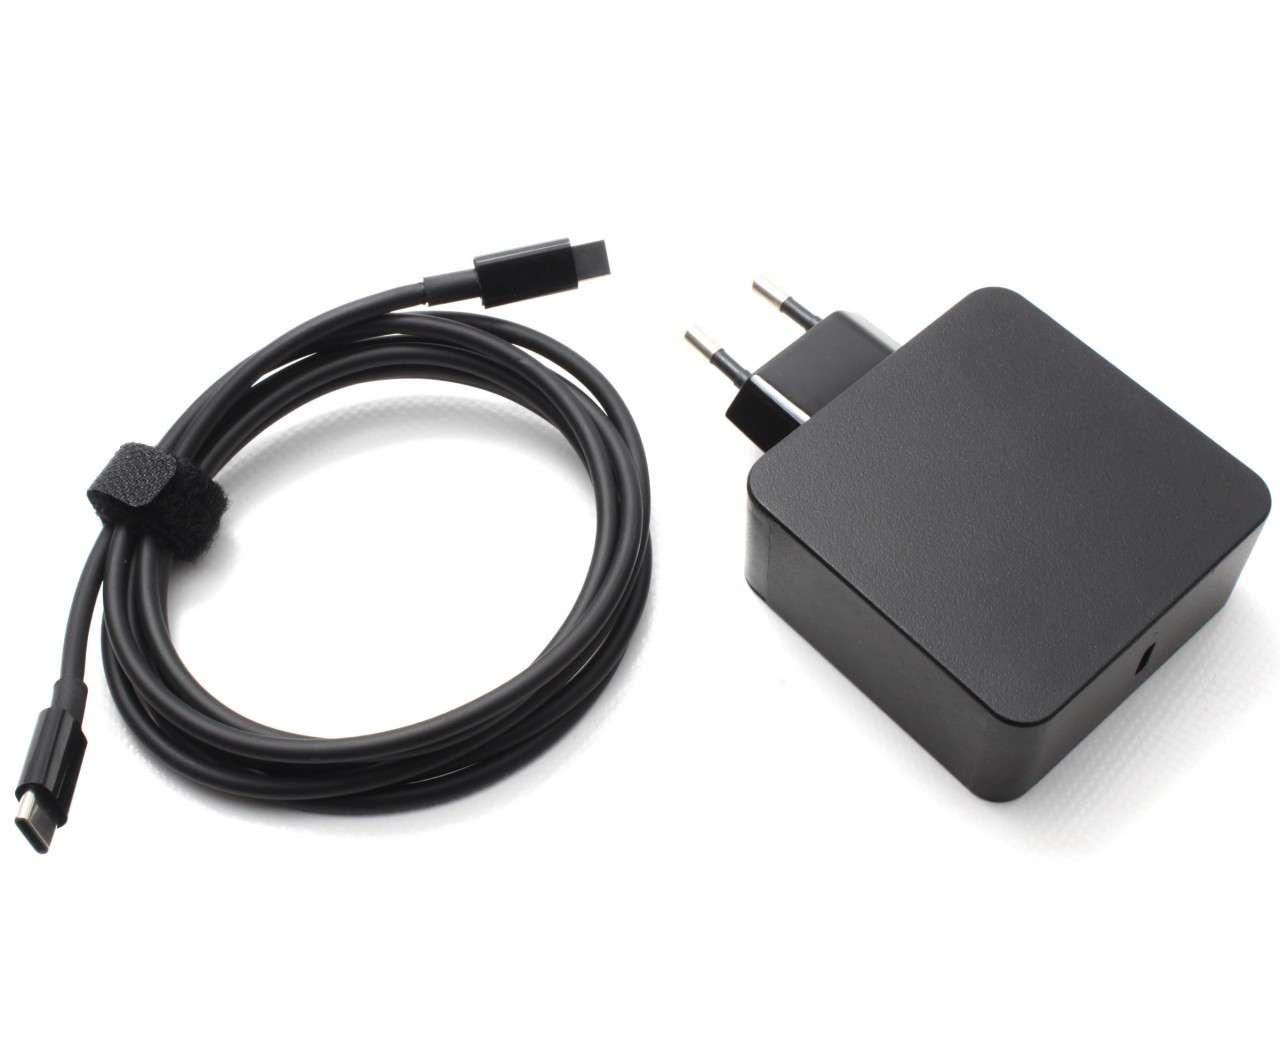 Incarcator HP Spectre x28 x2 Detachable 12-c024TU 65W imagine powerlaptop.ro 2021